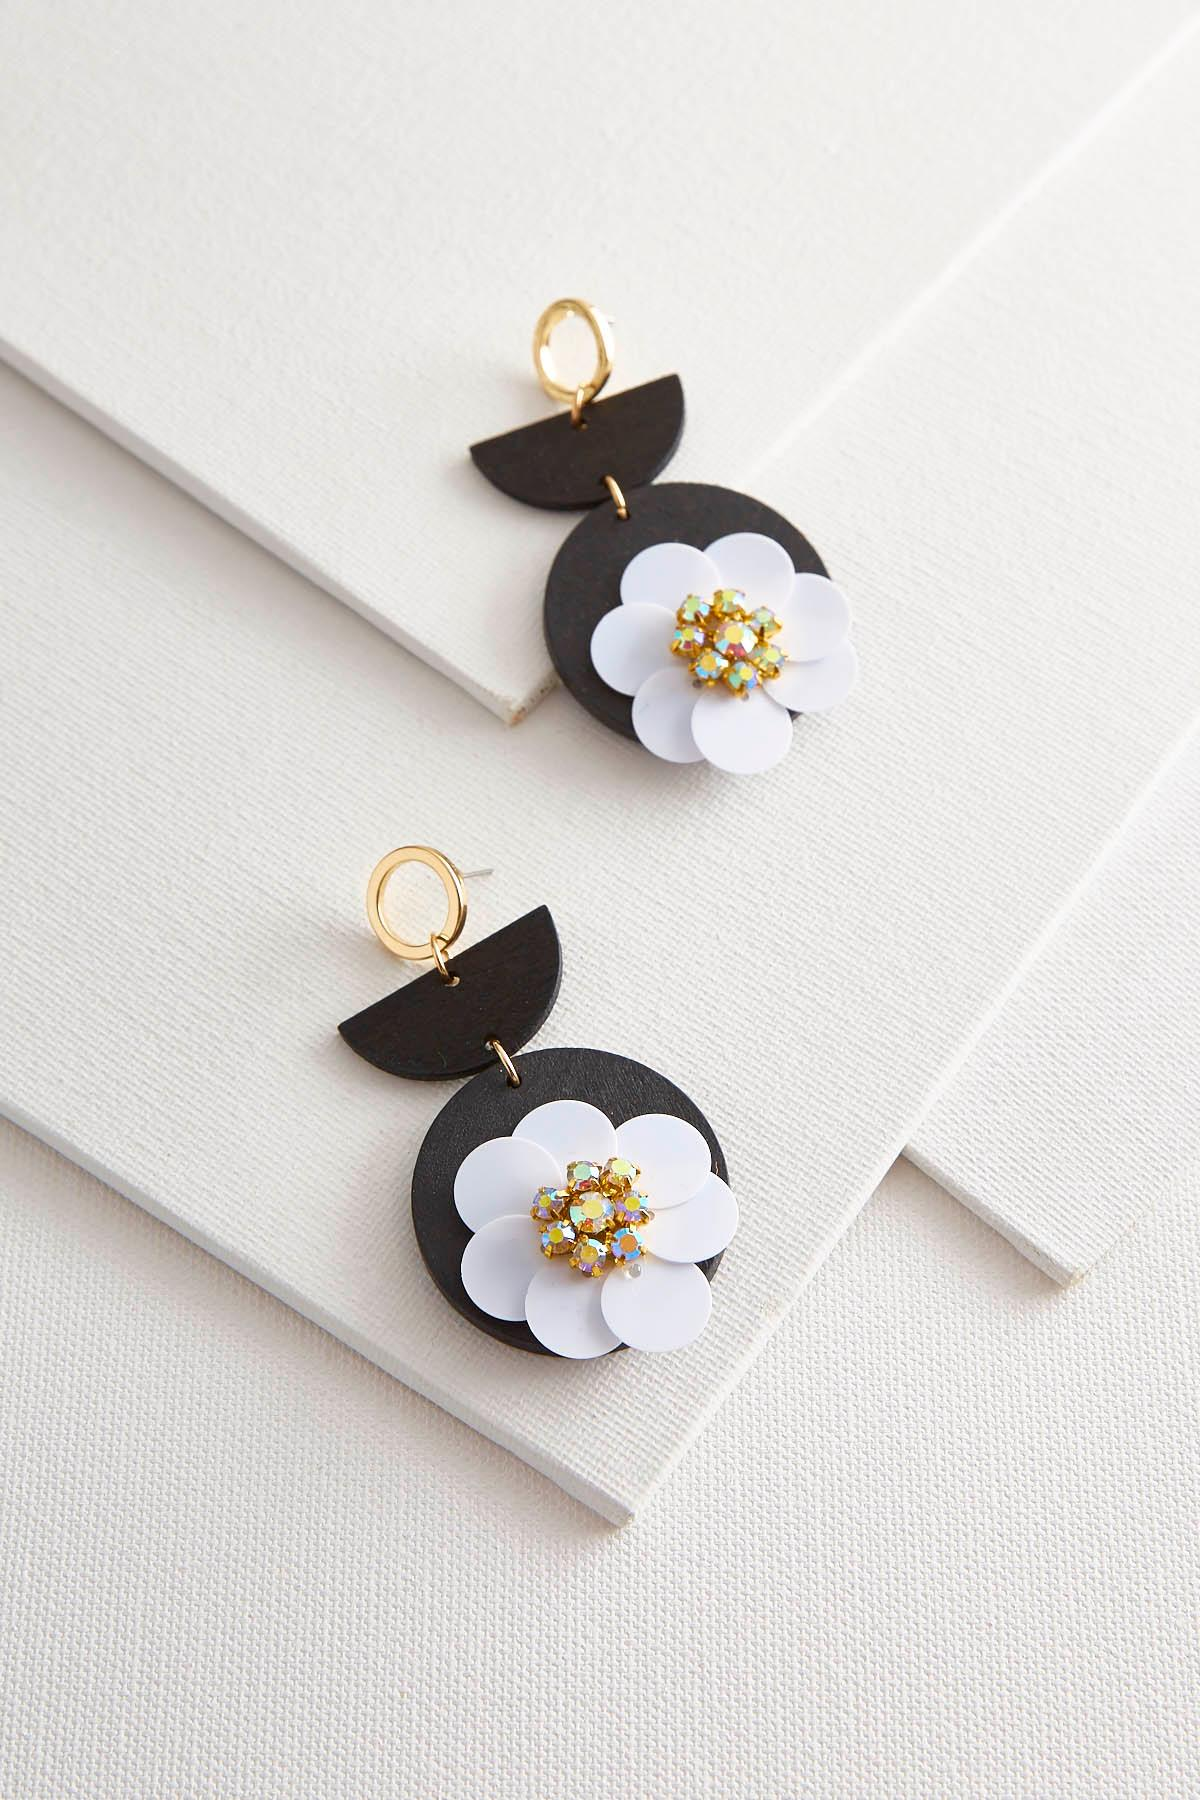 Wooden Sequin Flower Earrings